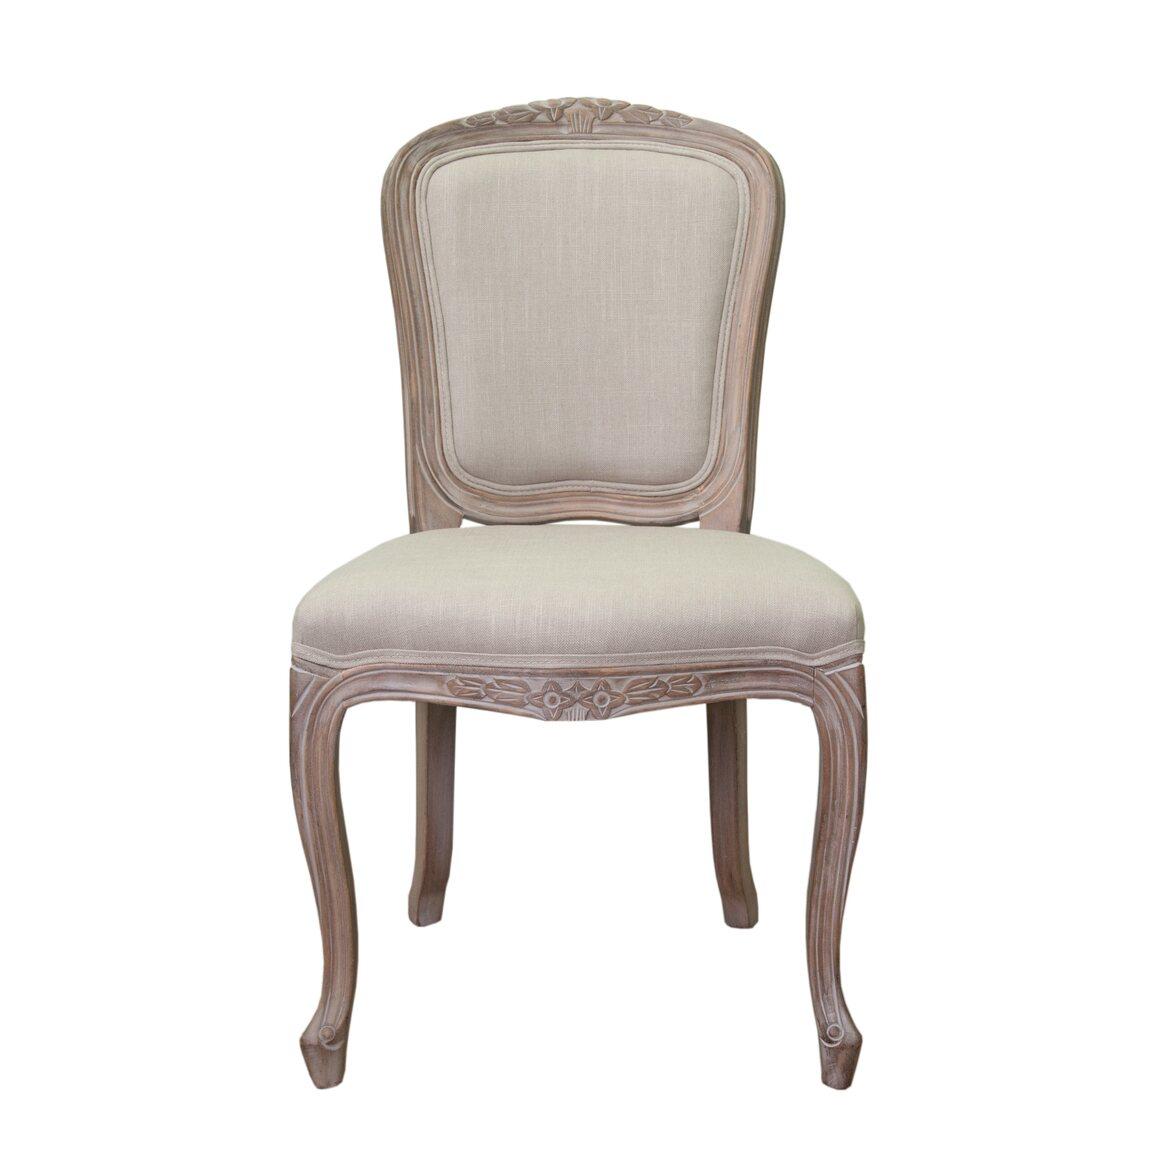 Стул Gran beige | Обеденные стулья Kingsby